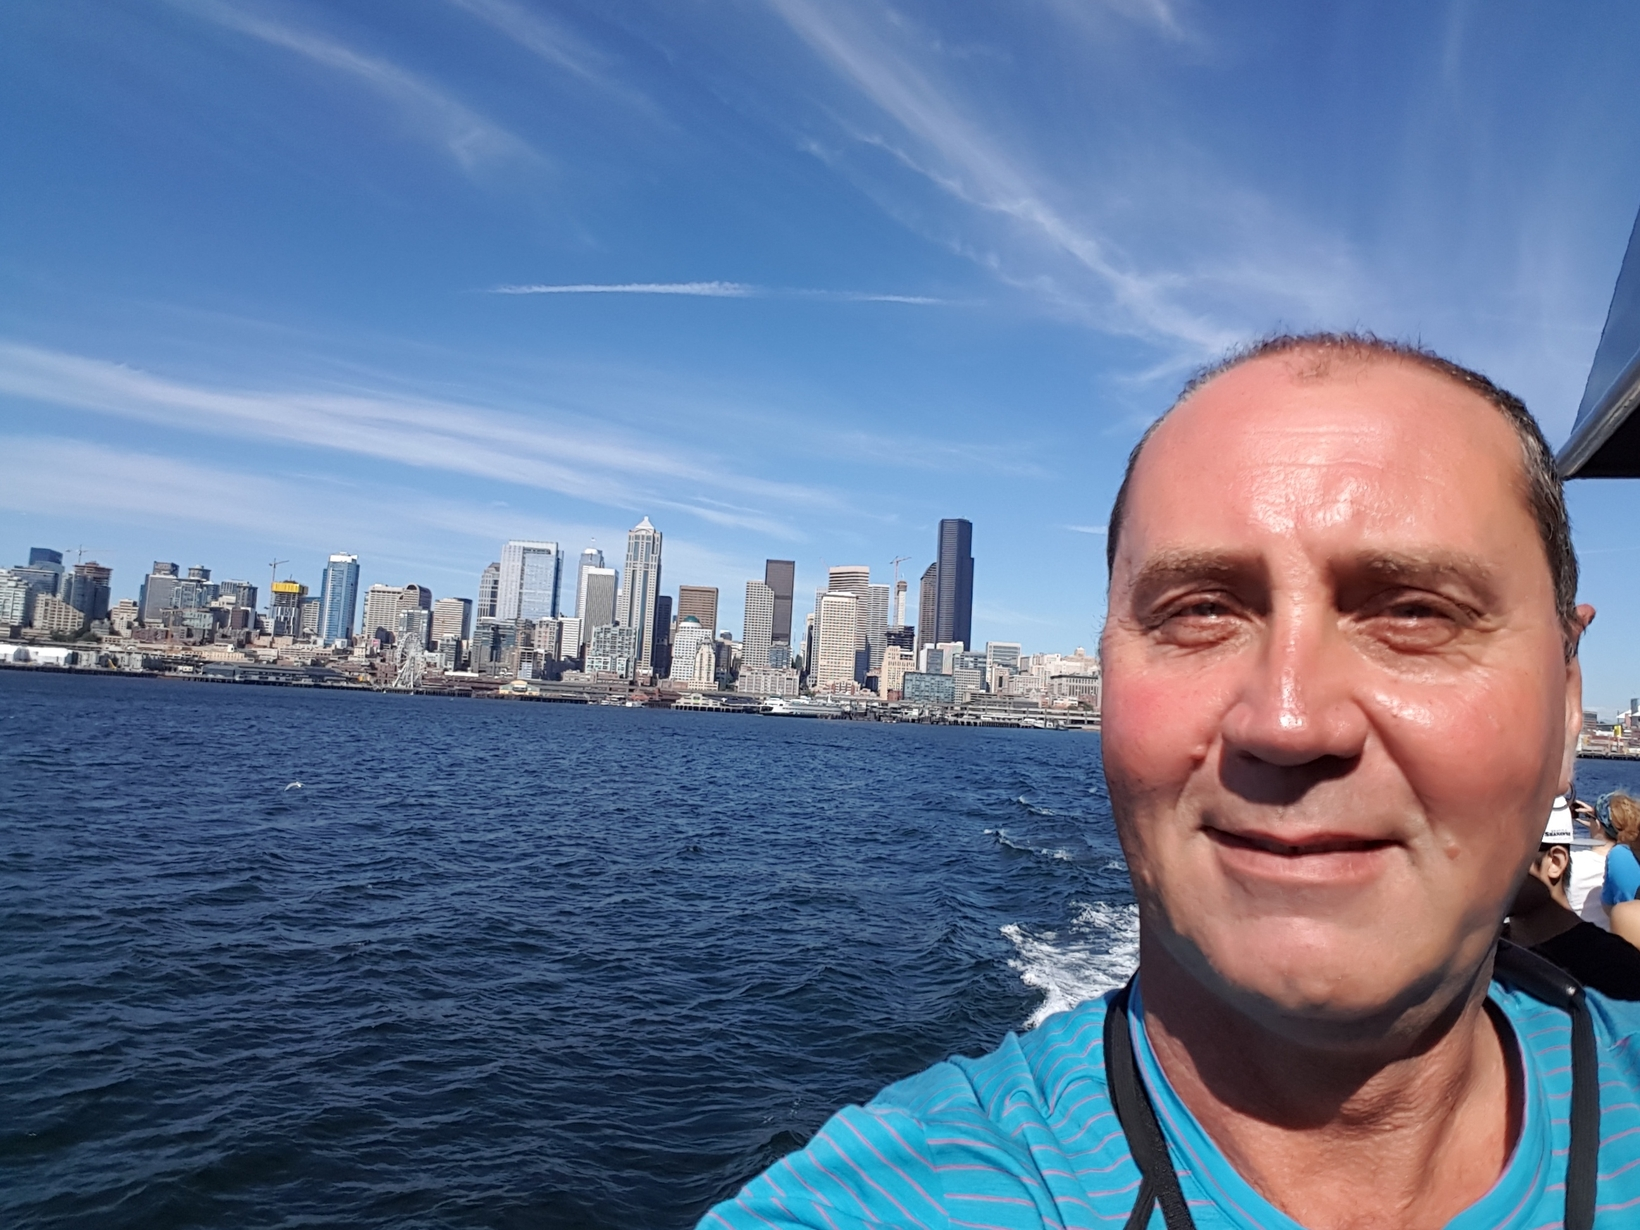 Steve from Perth, Western Australia, Australia